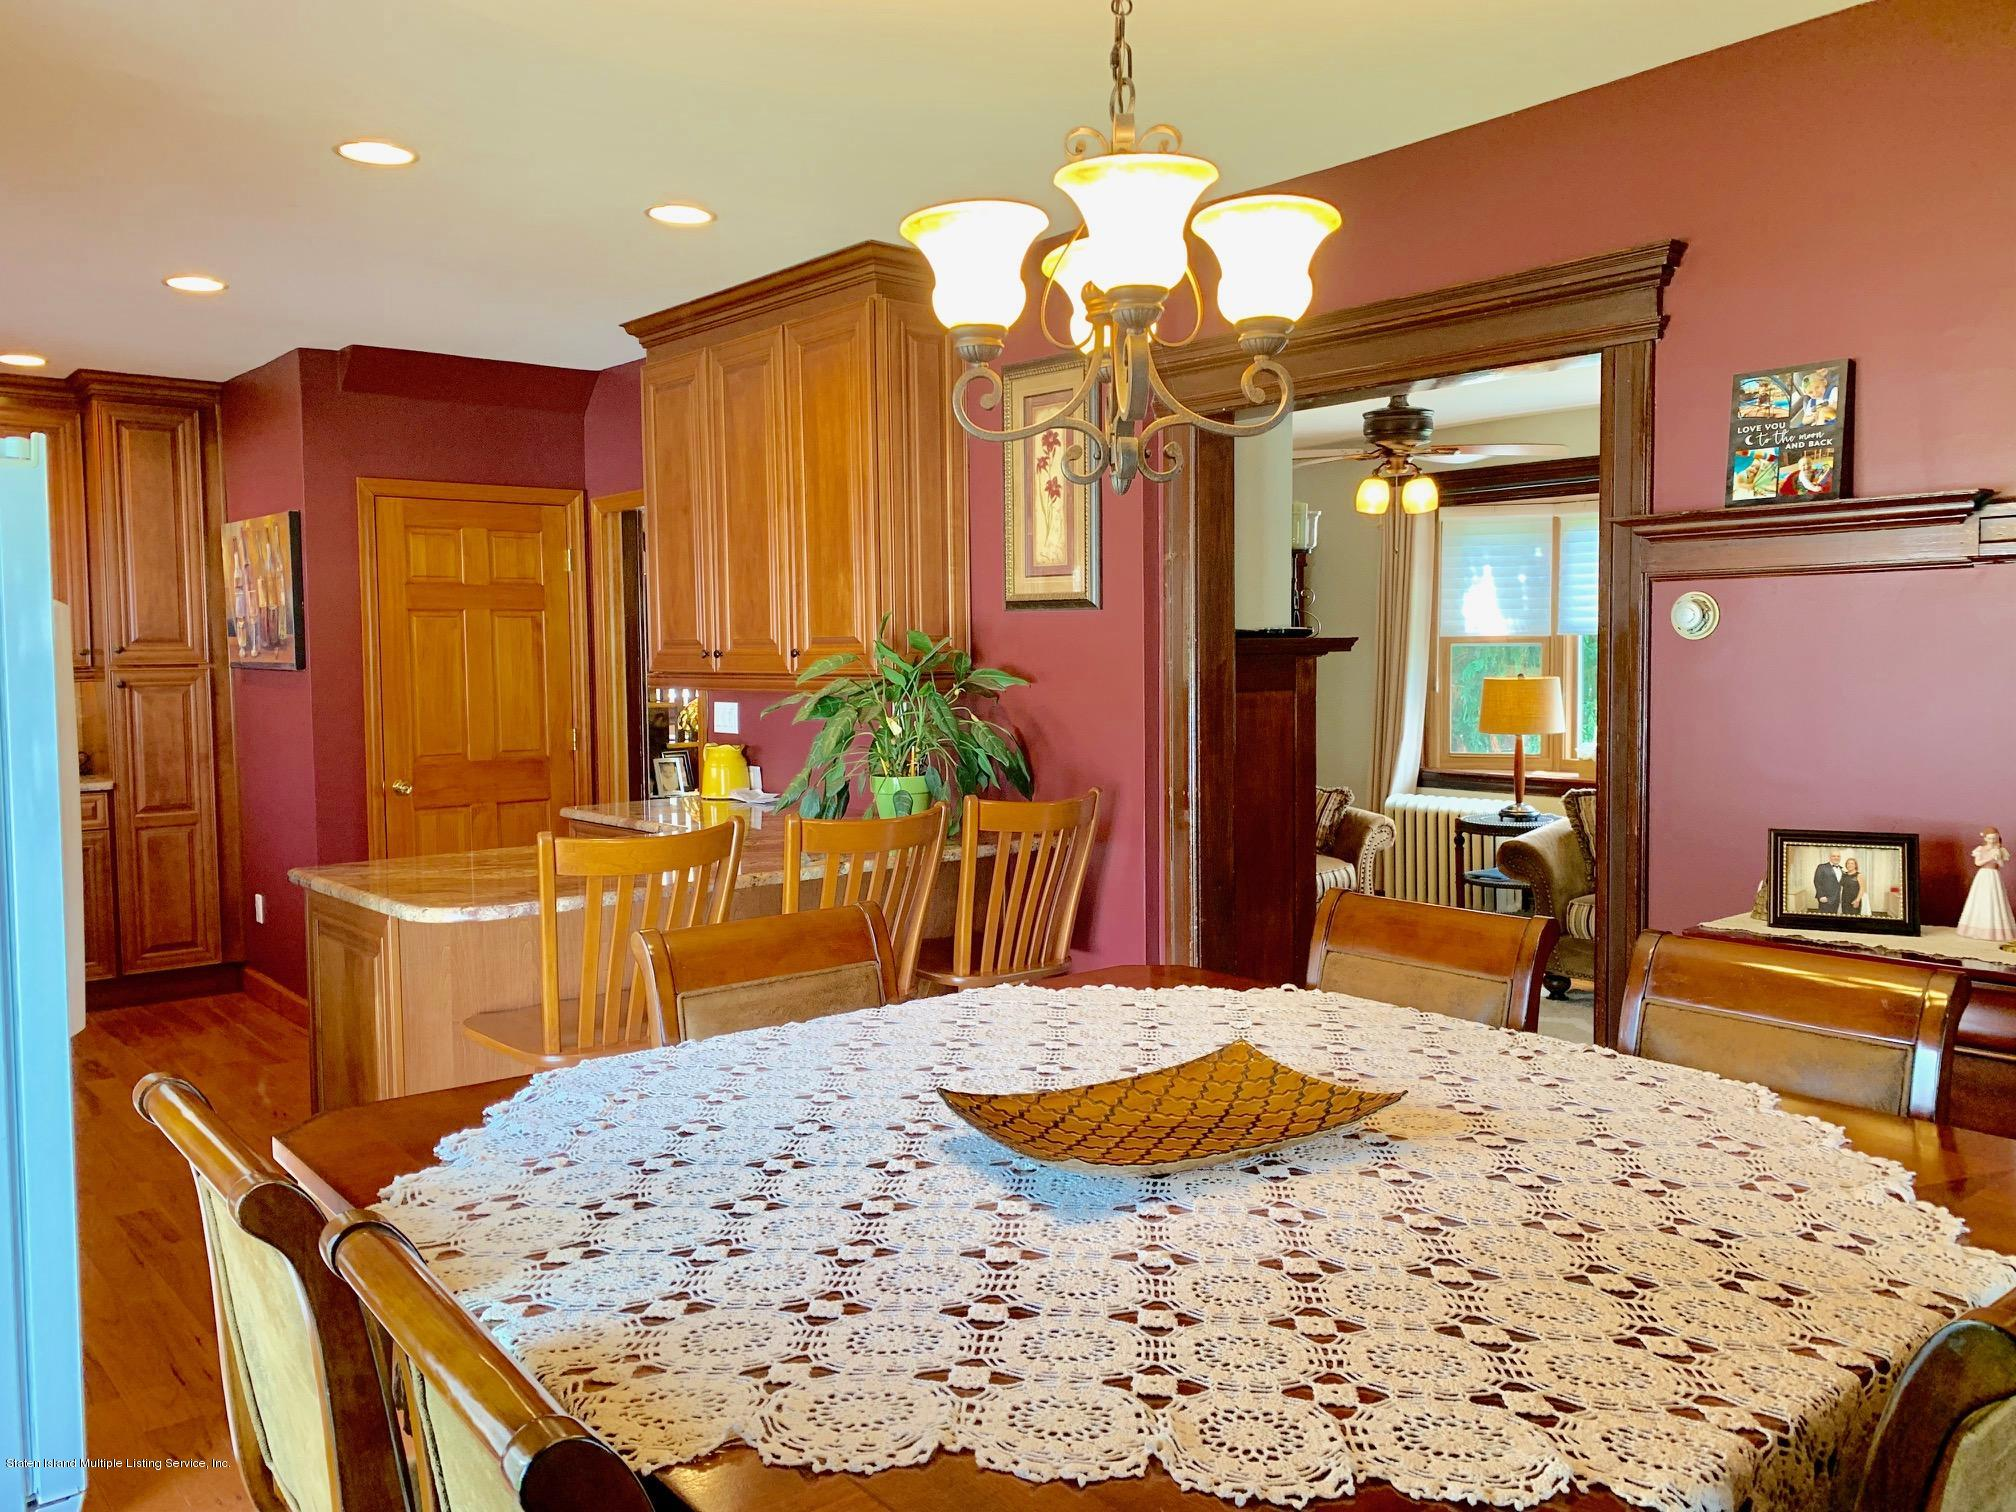 Single Family - Detached 195 Fairview Avenue  Staten Island, NY 10314, MLS-1132423-18